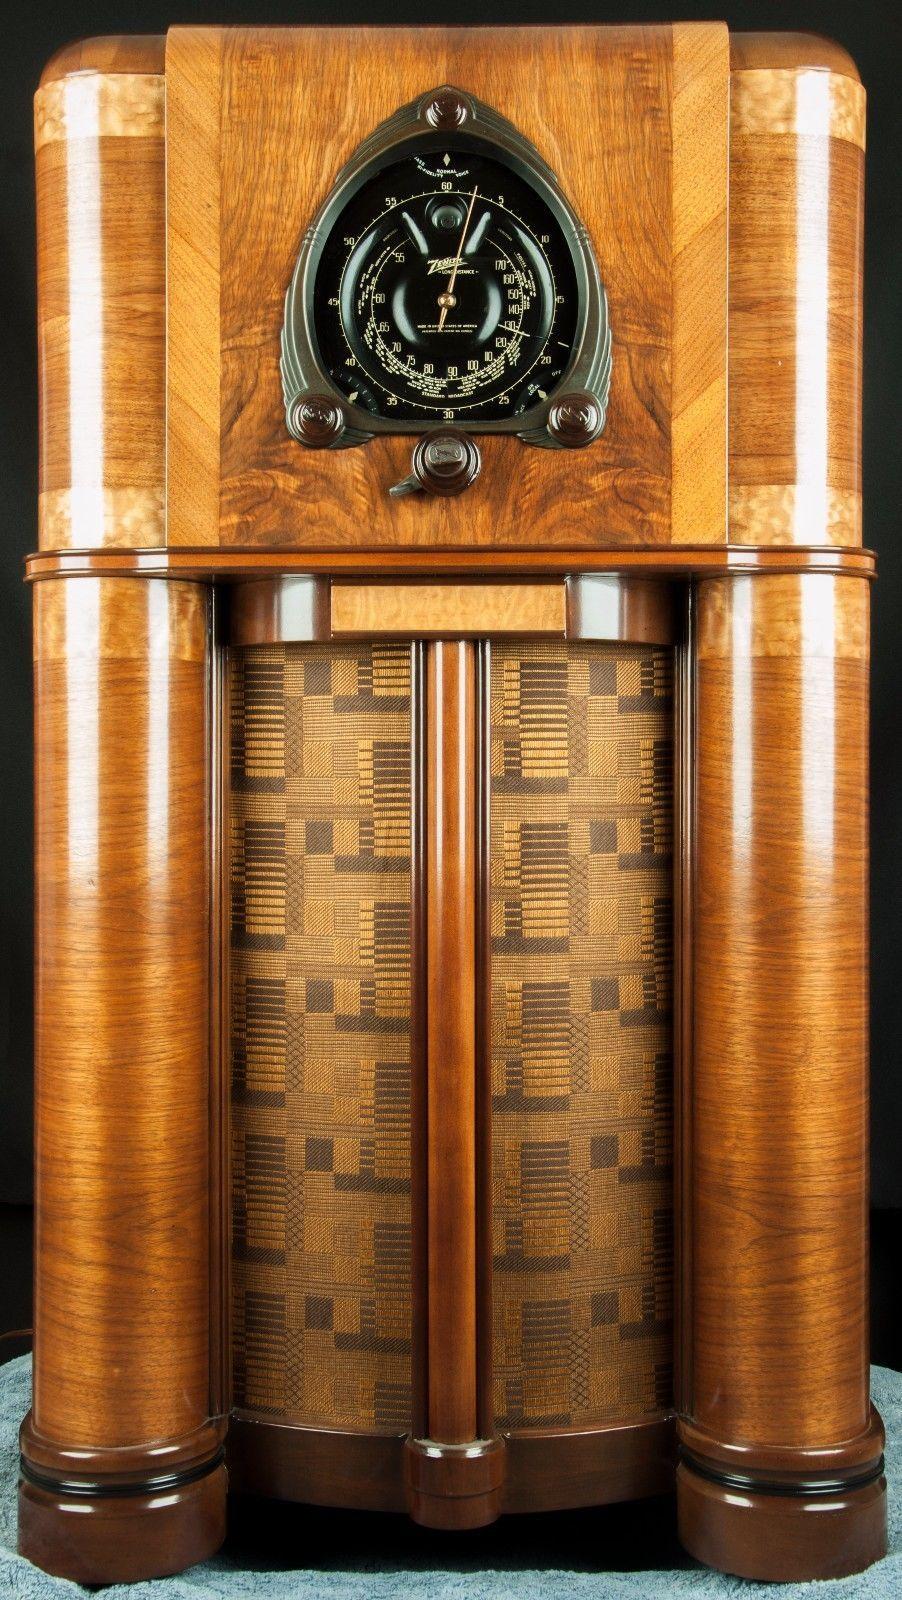 Zenith 1938 12 Tube Shutter Robot Dial Vacuum Tube Console Radio Restored Wor Ebay Vintage Radio Antique Radio Retro Radios